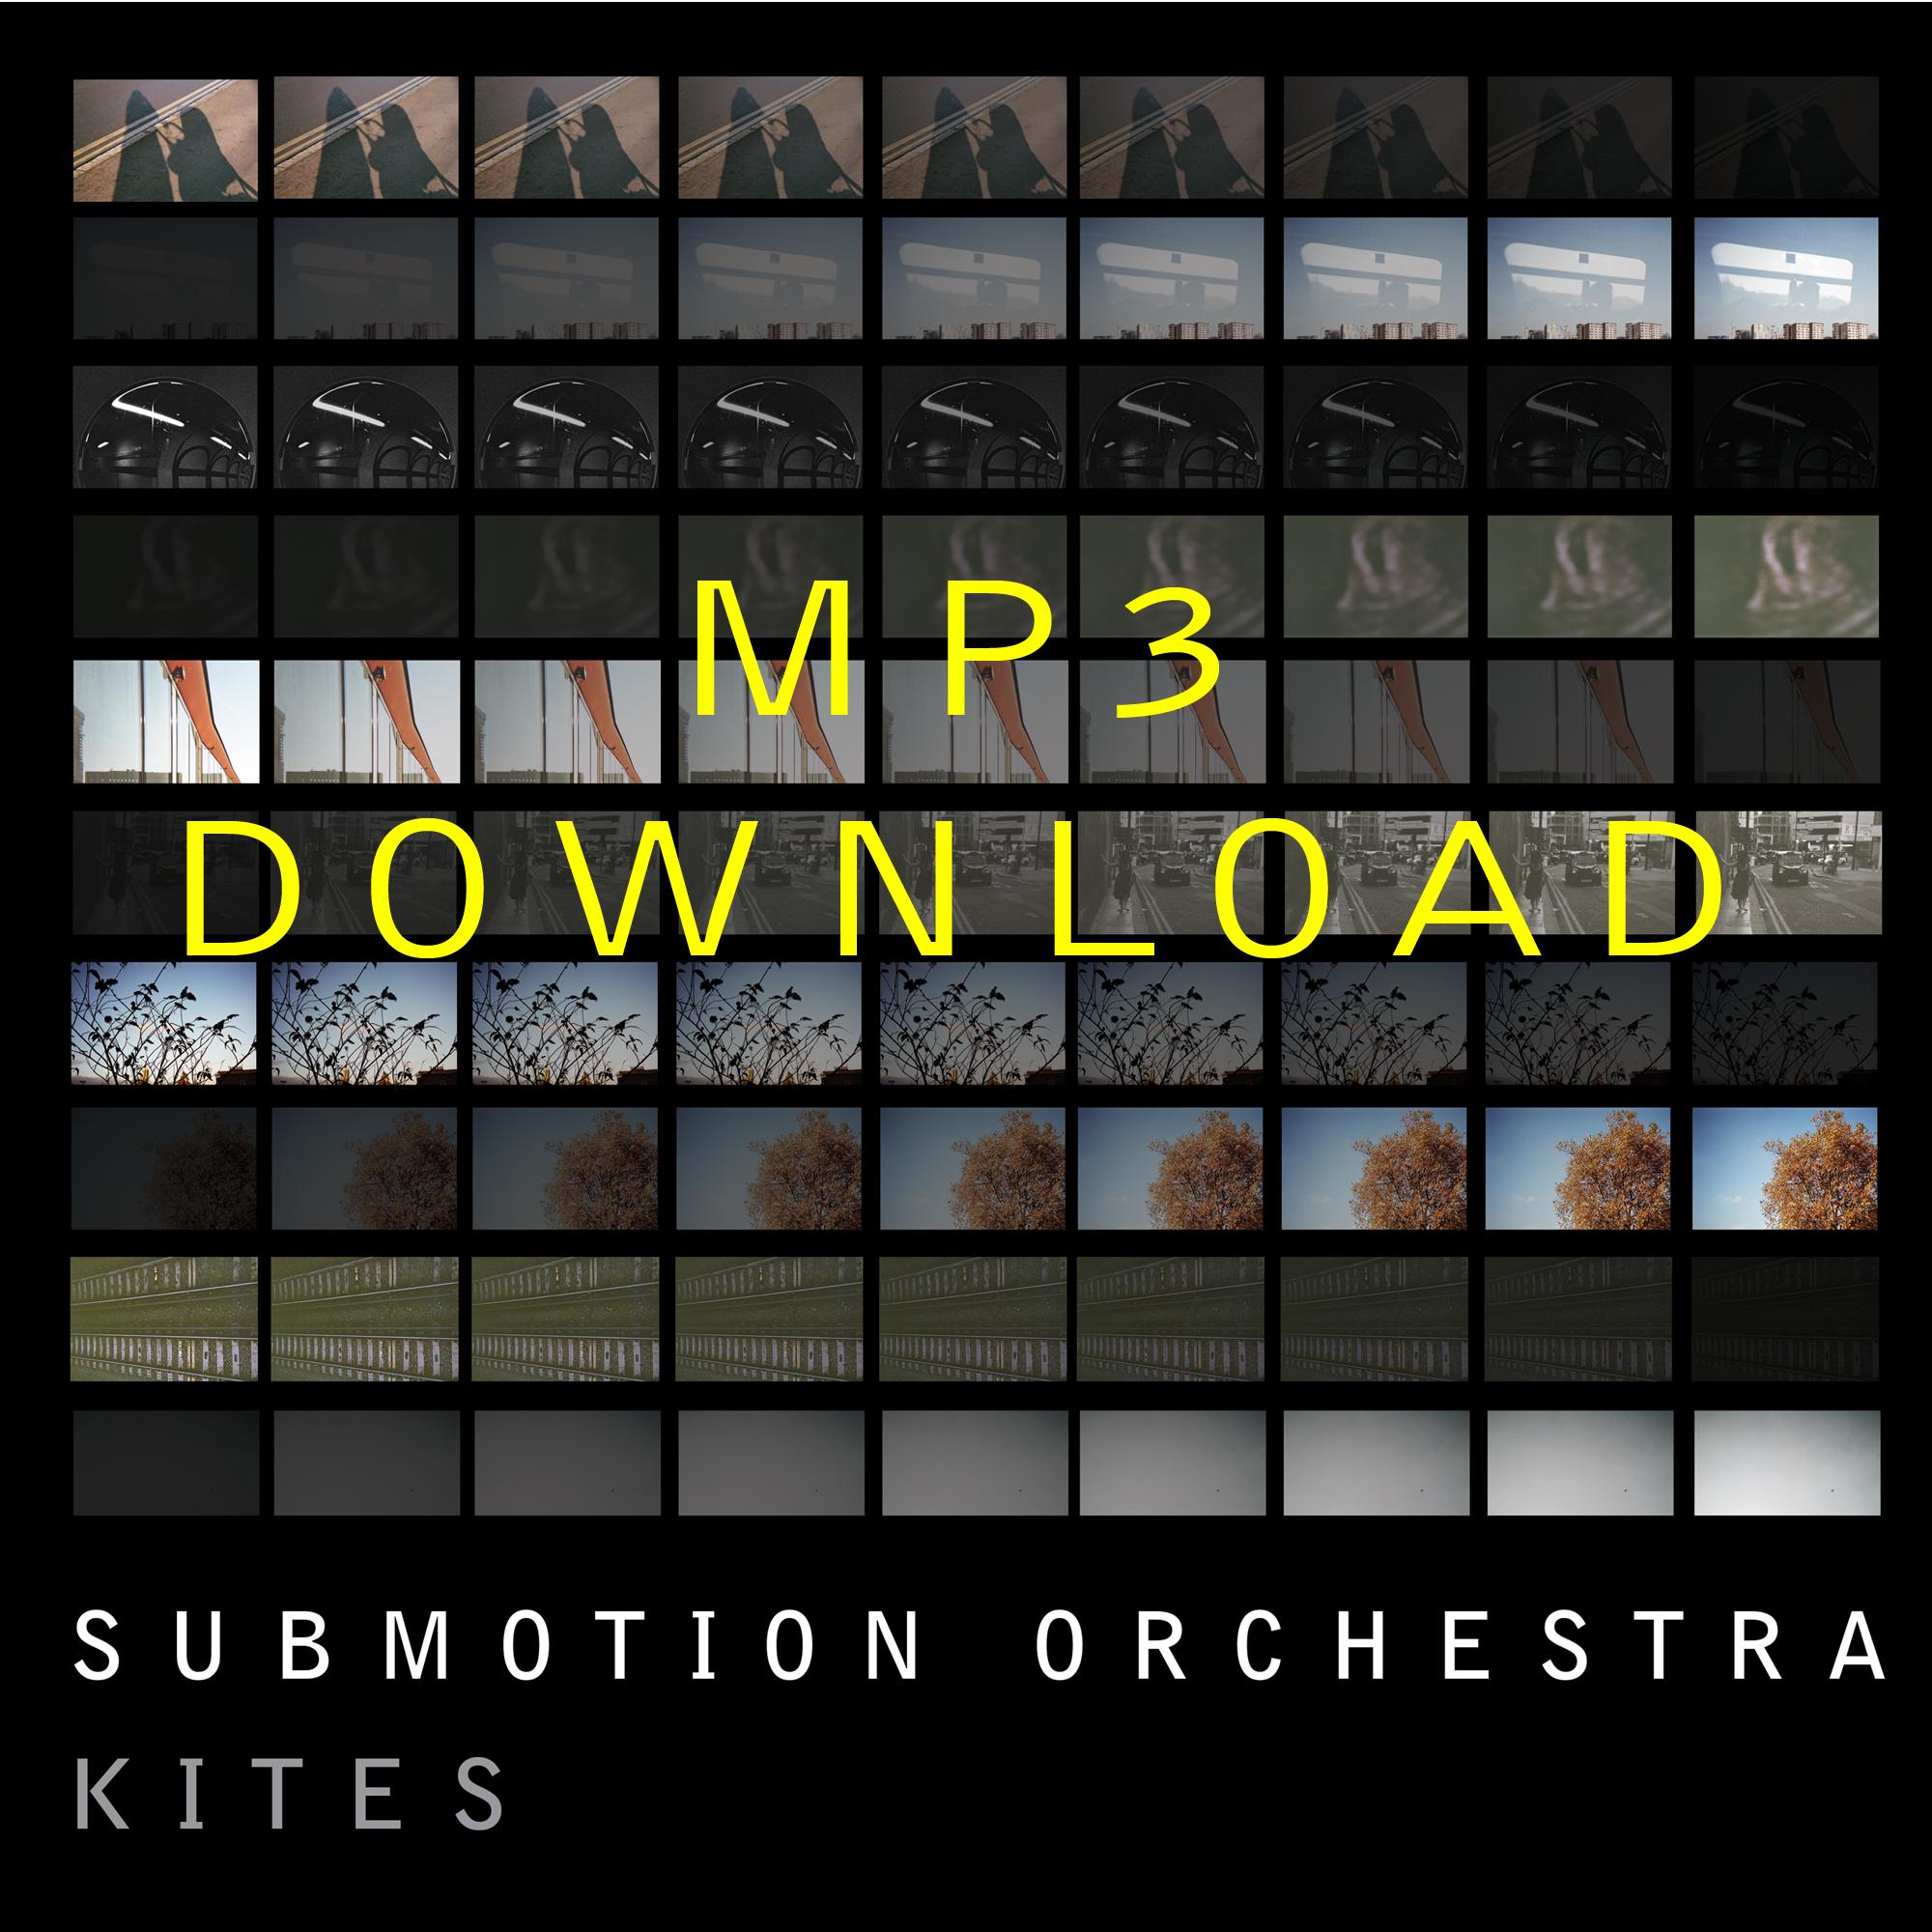 Kites Album - MP3 Download - Submotion Orchestra